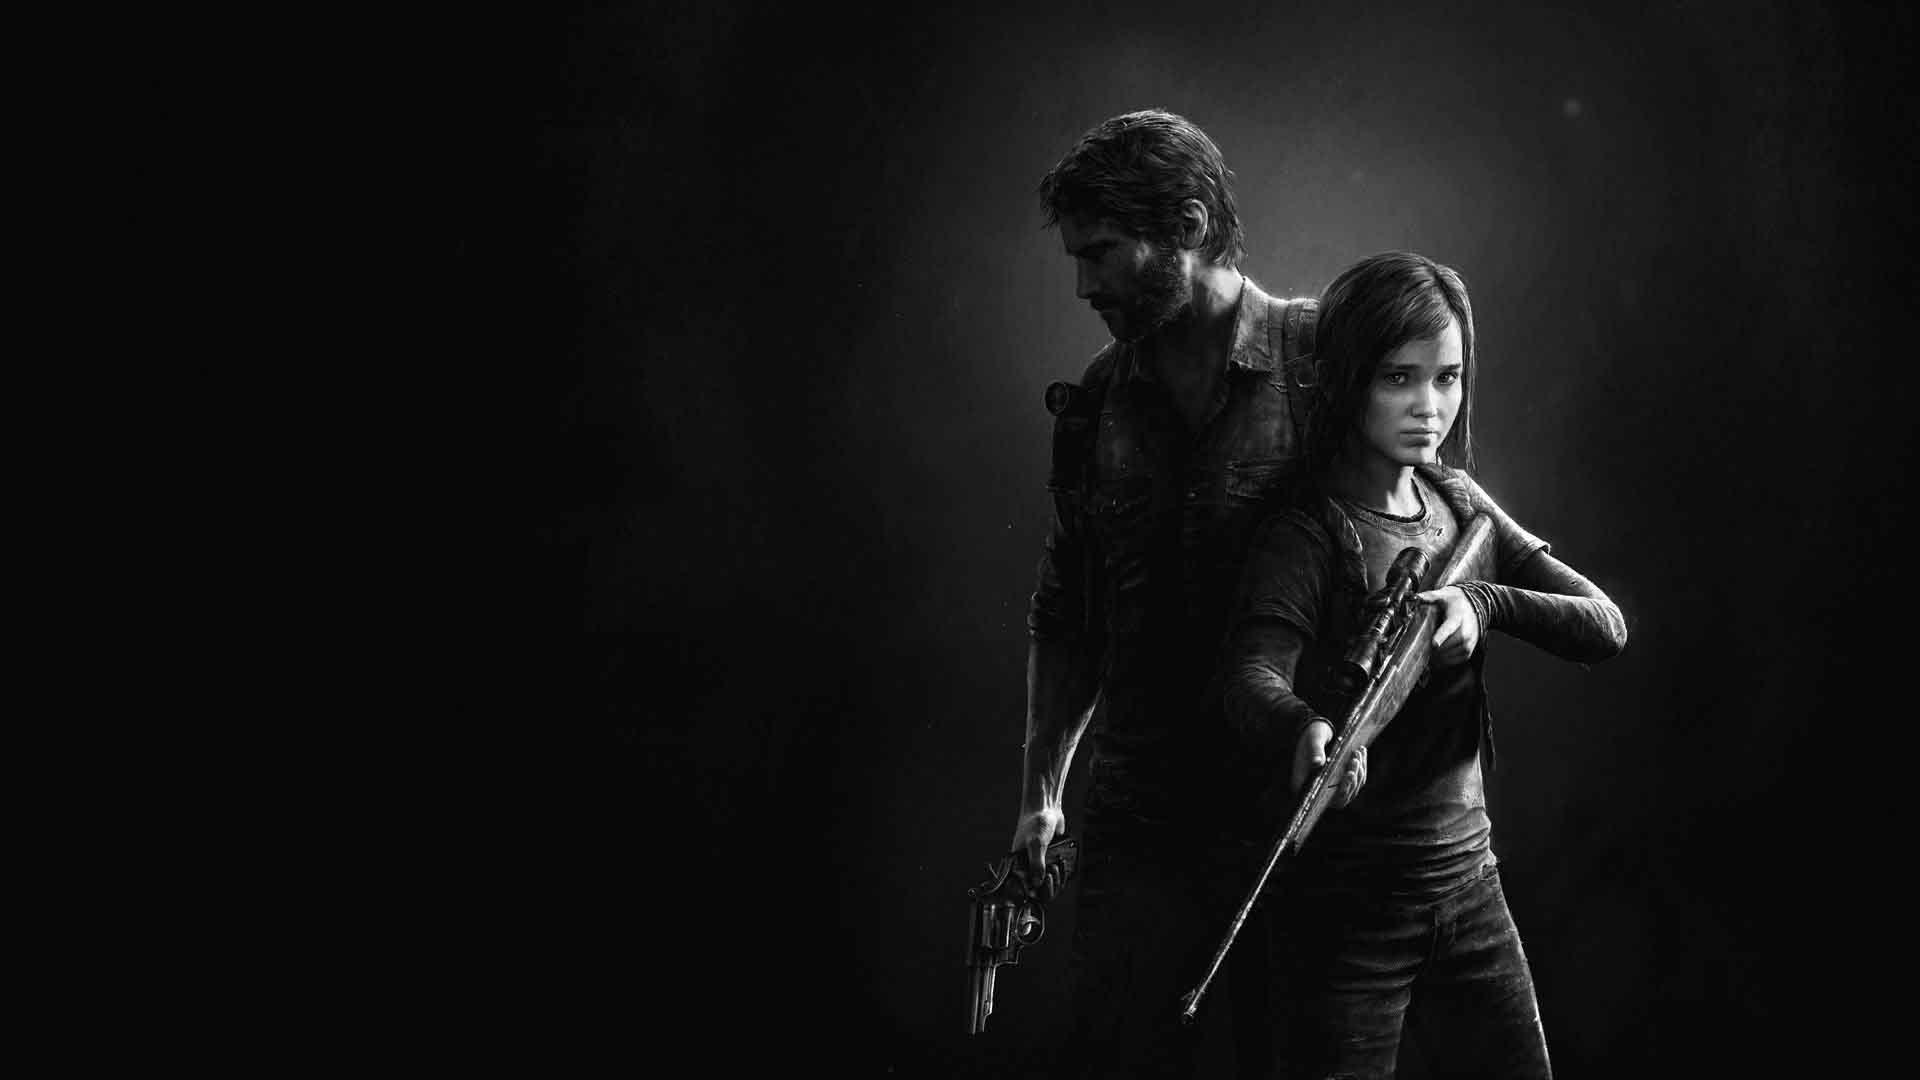 Joel y Ellie, protagonistas de The Last of Us